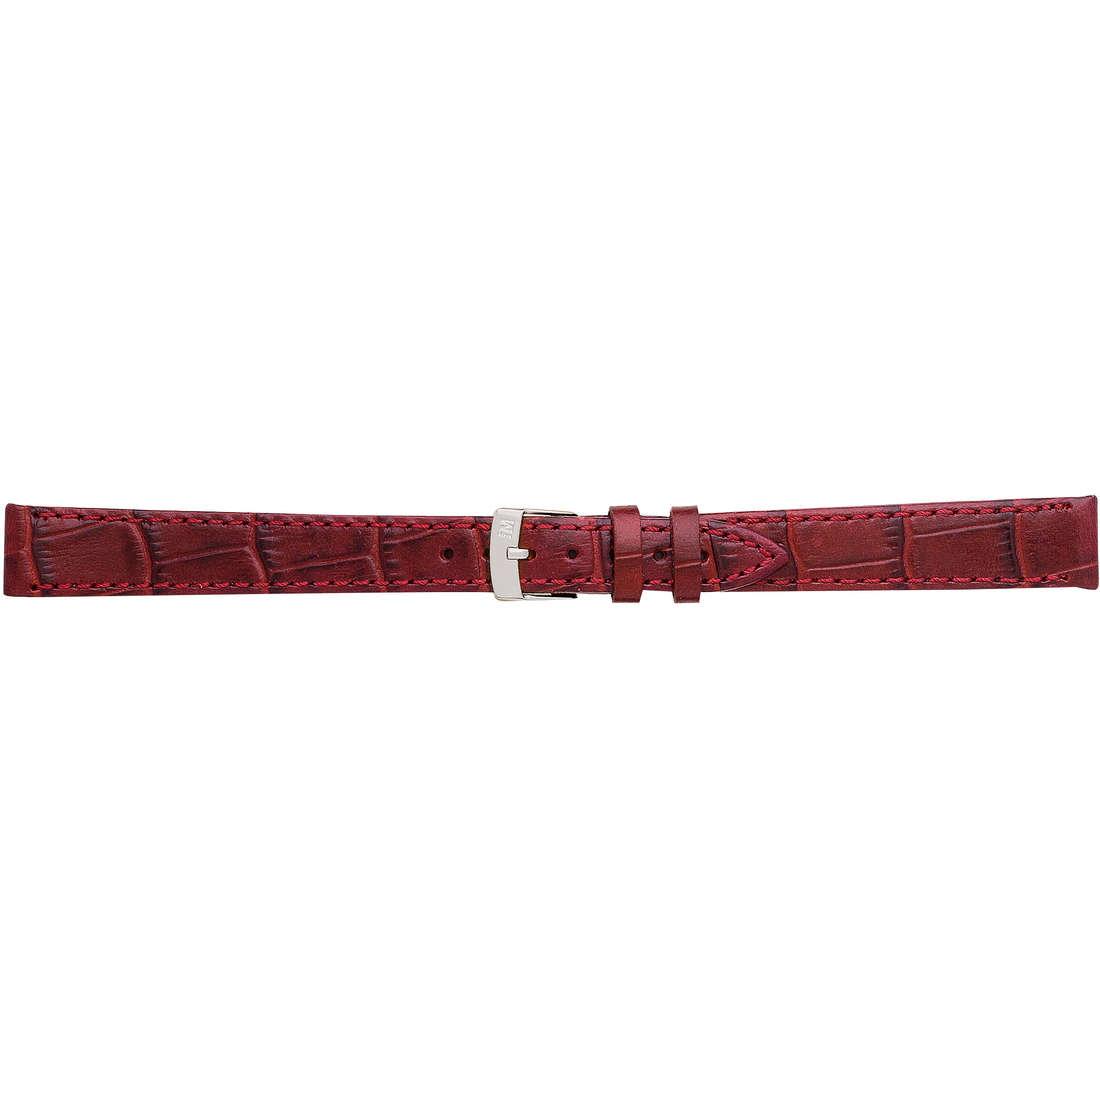 montre bande de montres unisex Morellato I Lunghi A01Y2524656081CR14